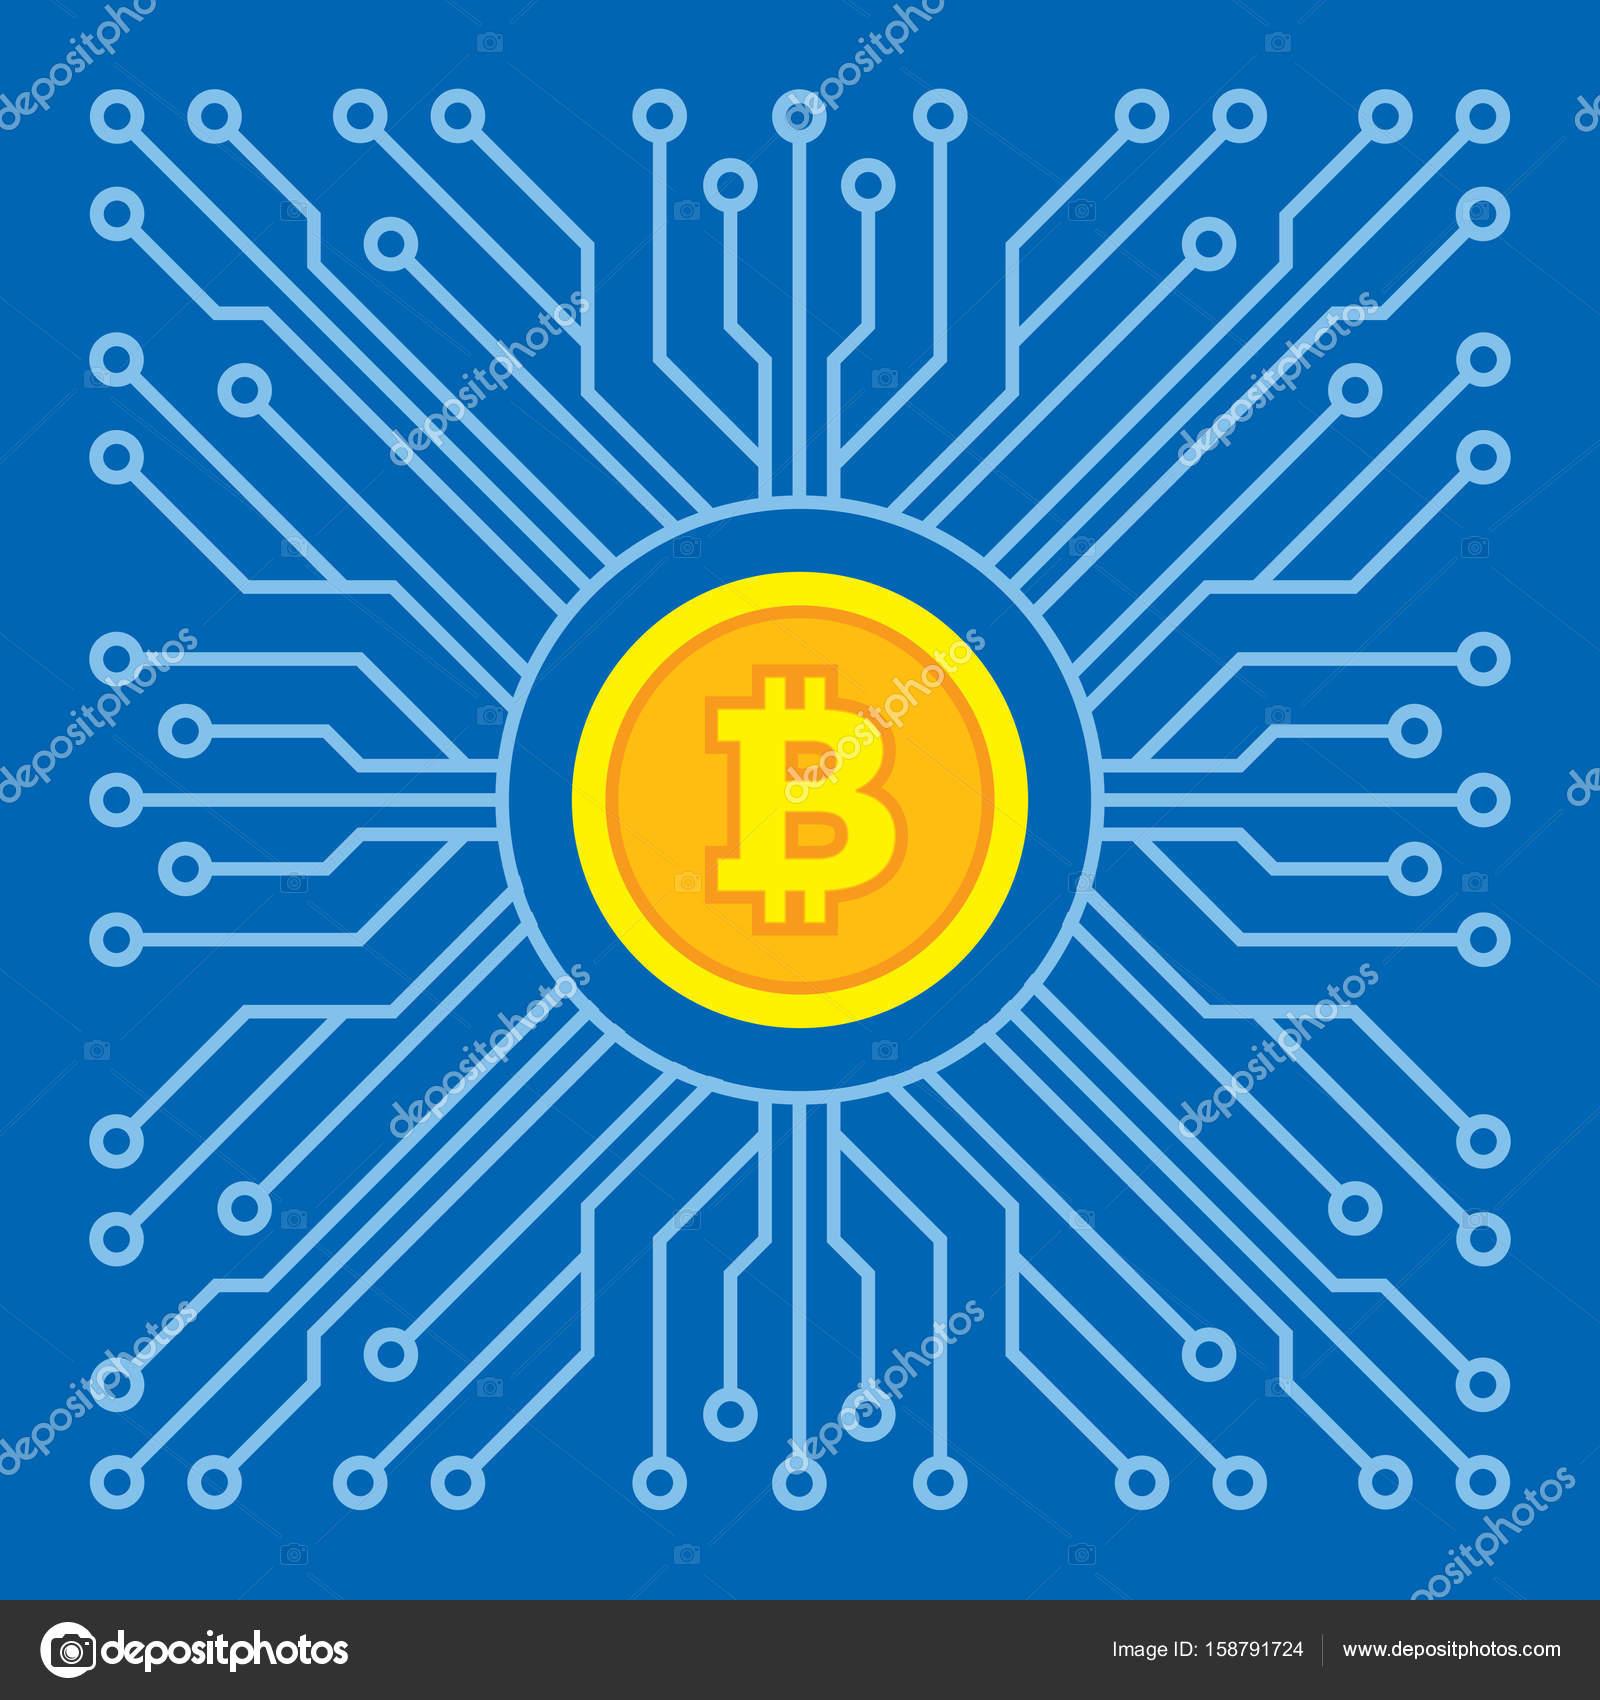 Bitcoin blockchain tecnologia moderna ilustrao vetorial criativo bitcoin blockchain tecnologia moderna ilustrao vetorial criativo smbolo de conceito de dinheiro digital cryptocurrency ccuart Choice Image